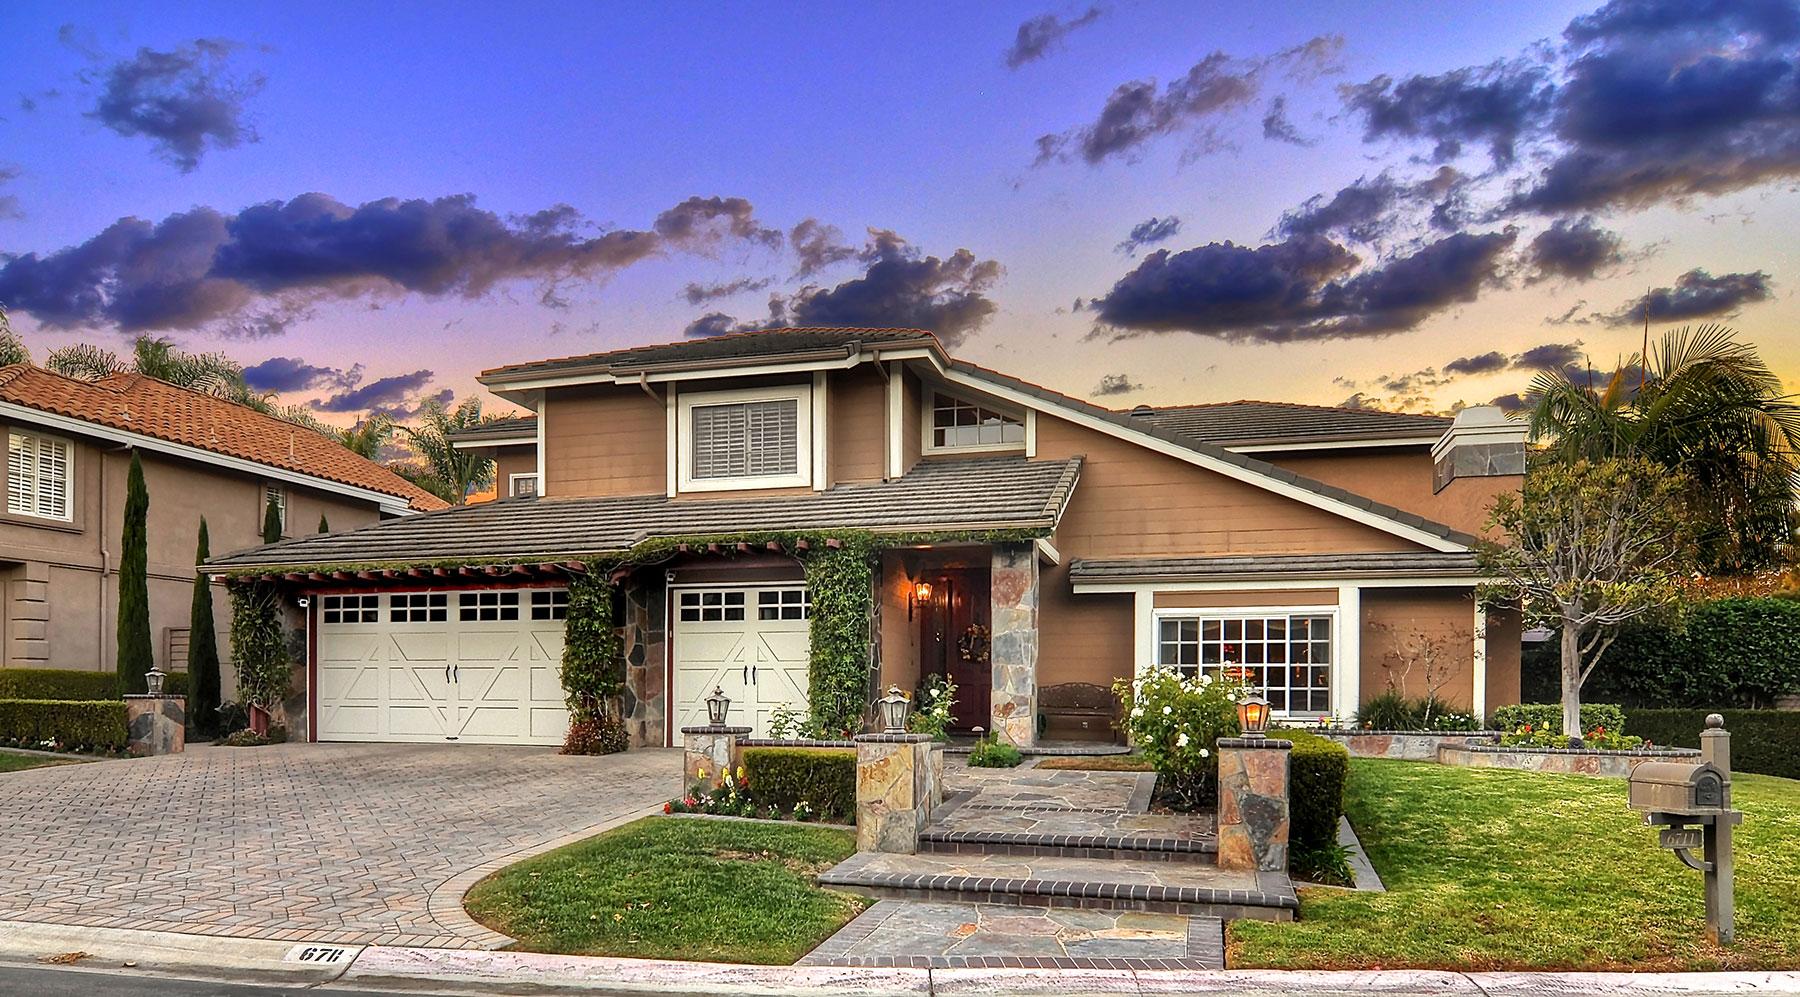 Single Family Home for Sale at 6711 Shetland Circle Huntington Beach, California, 92648 United States